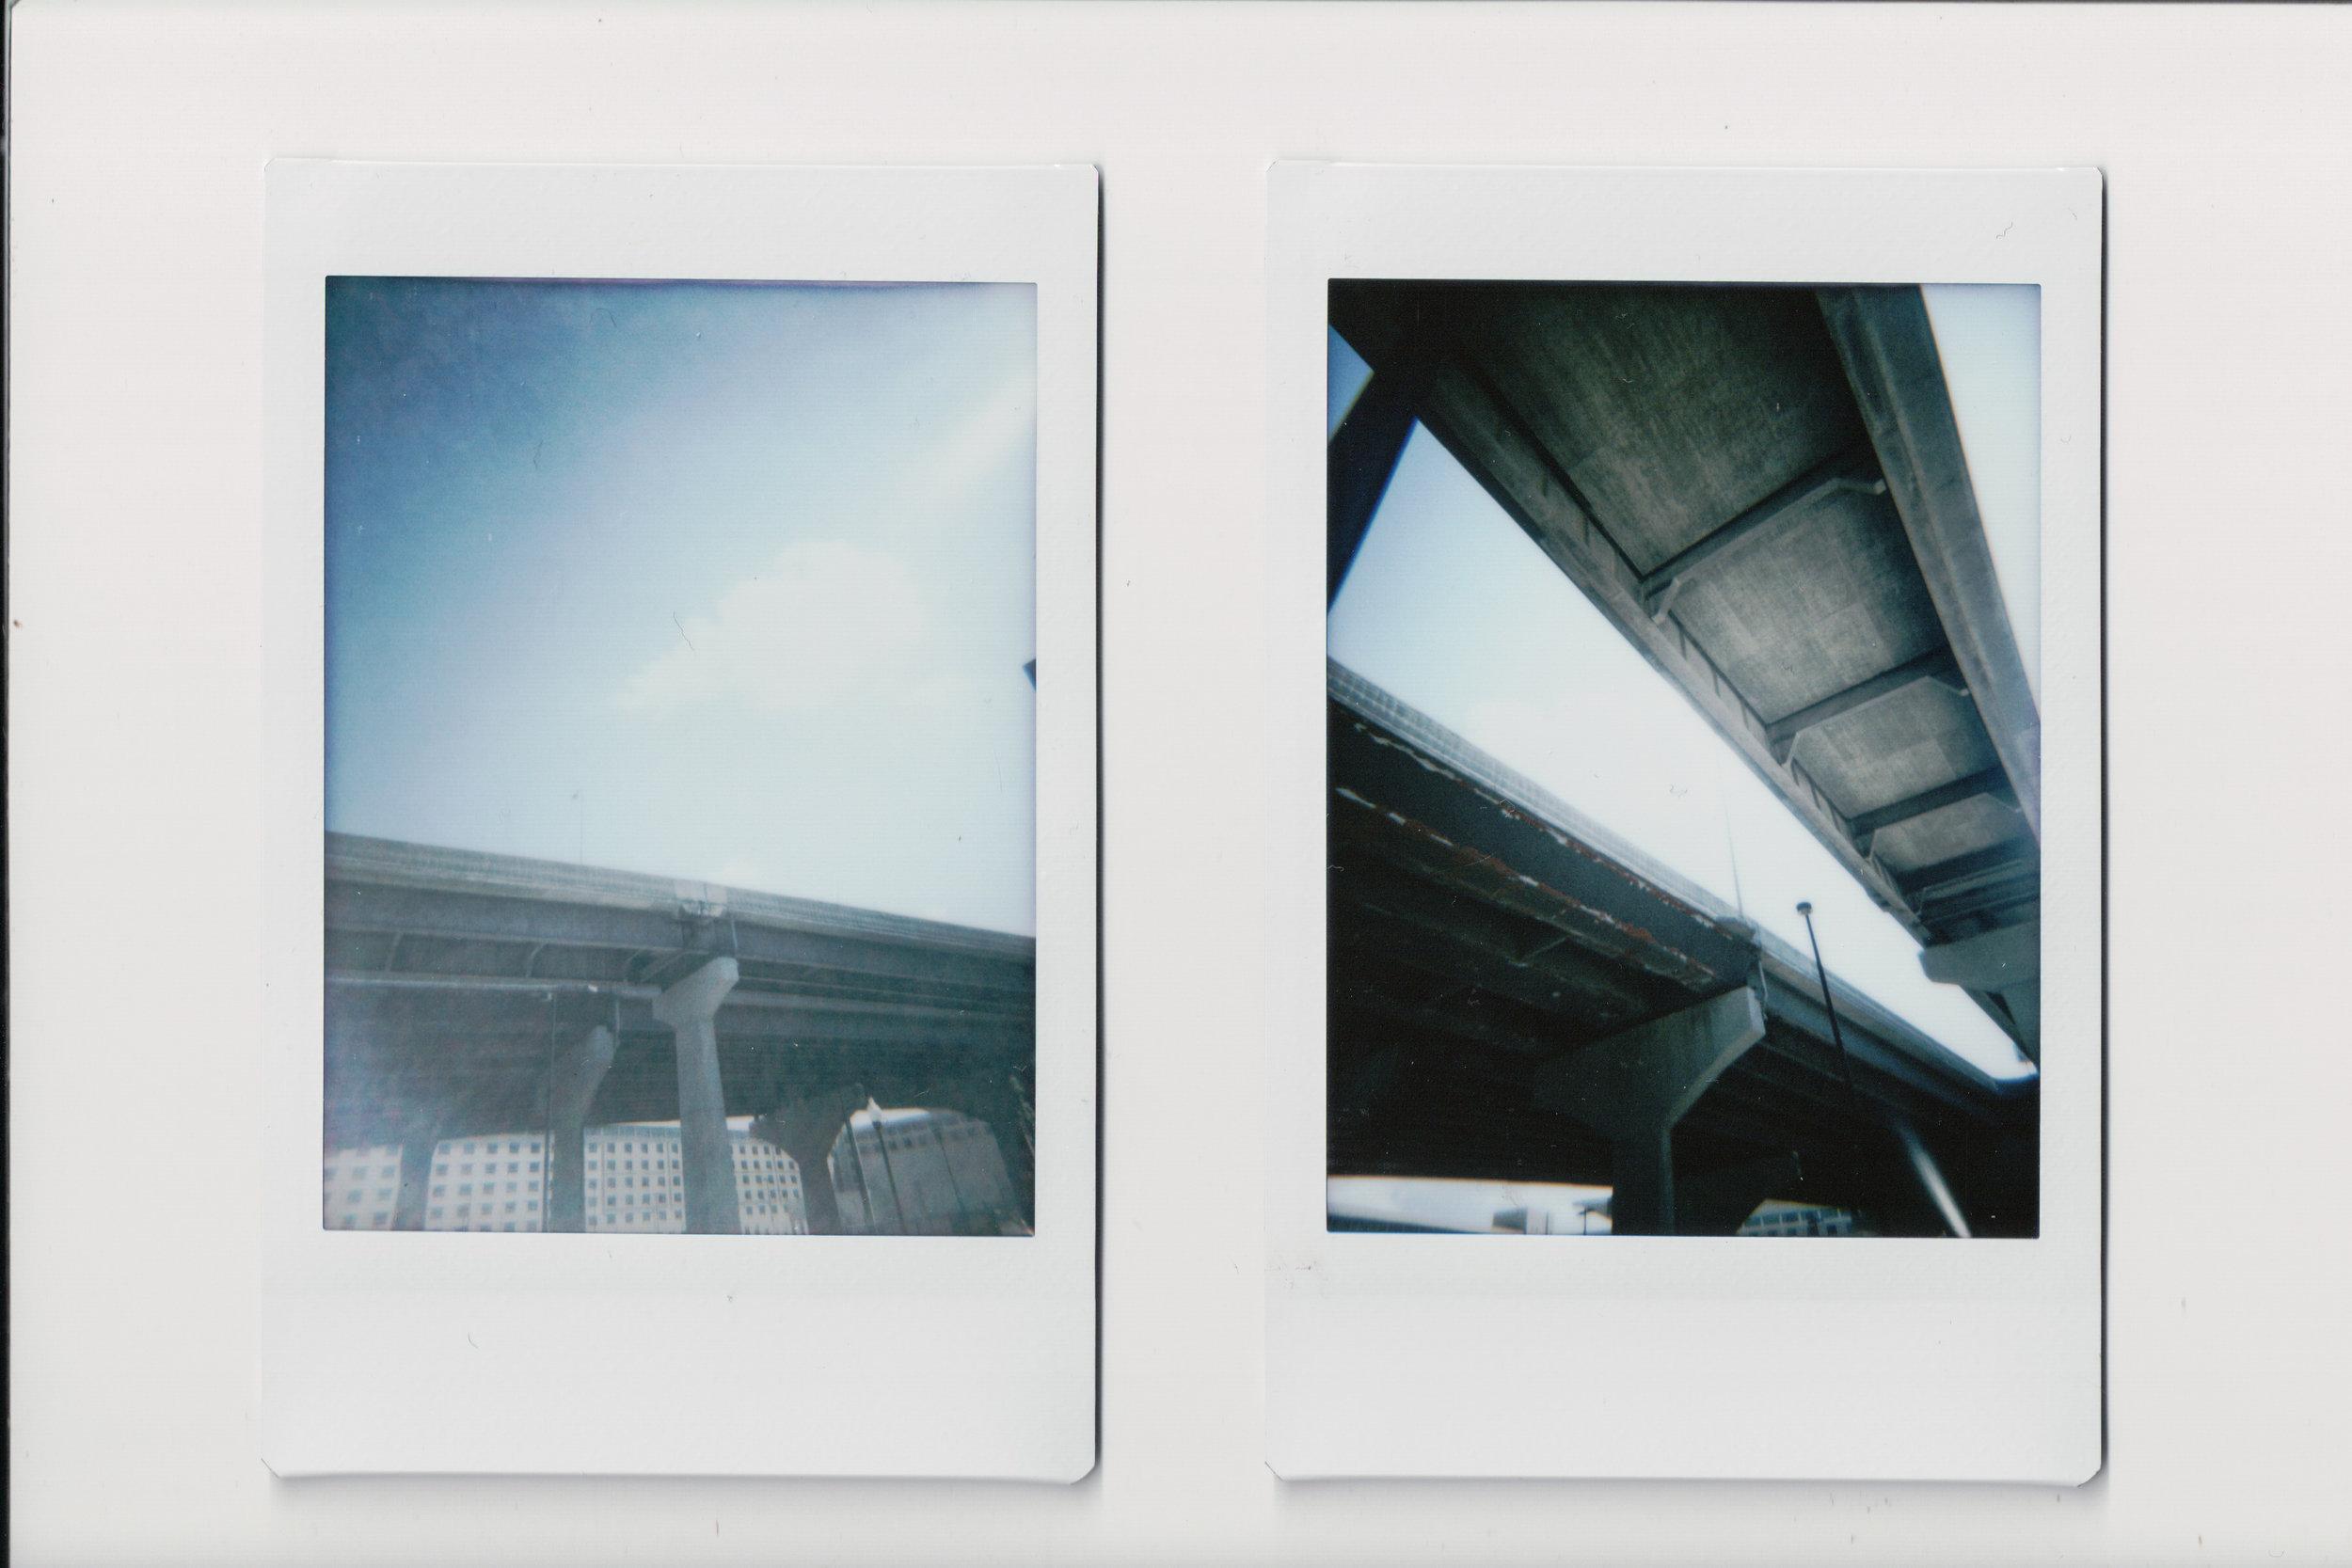 Under/overpass